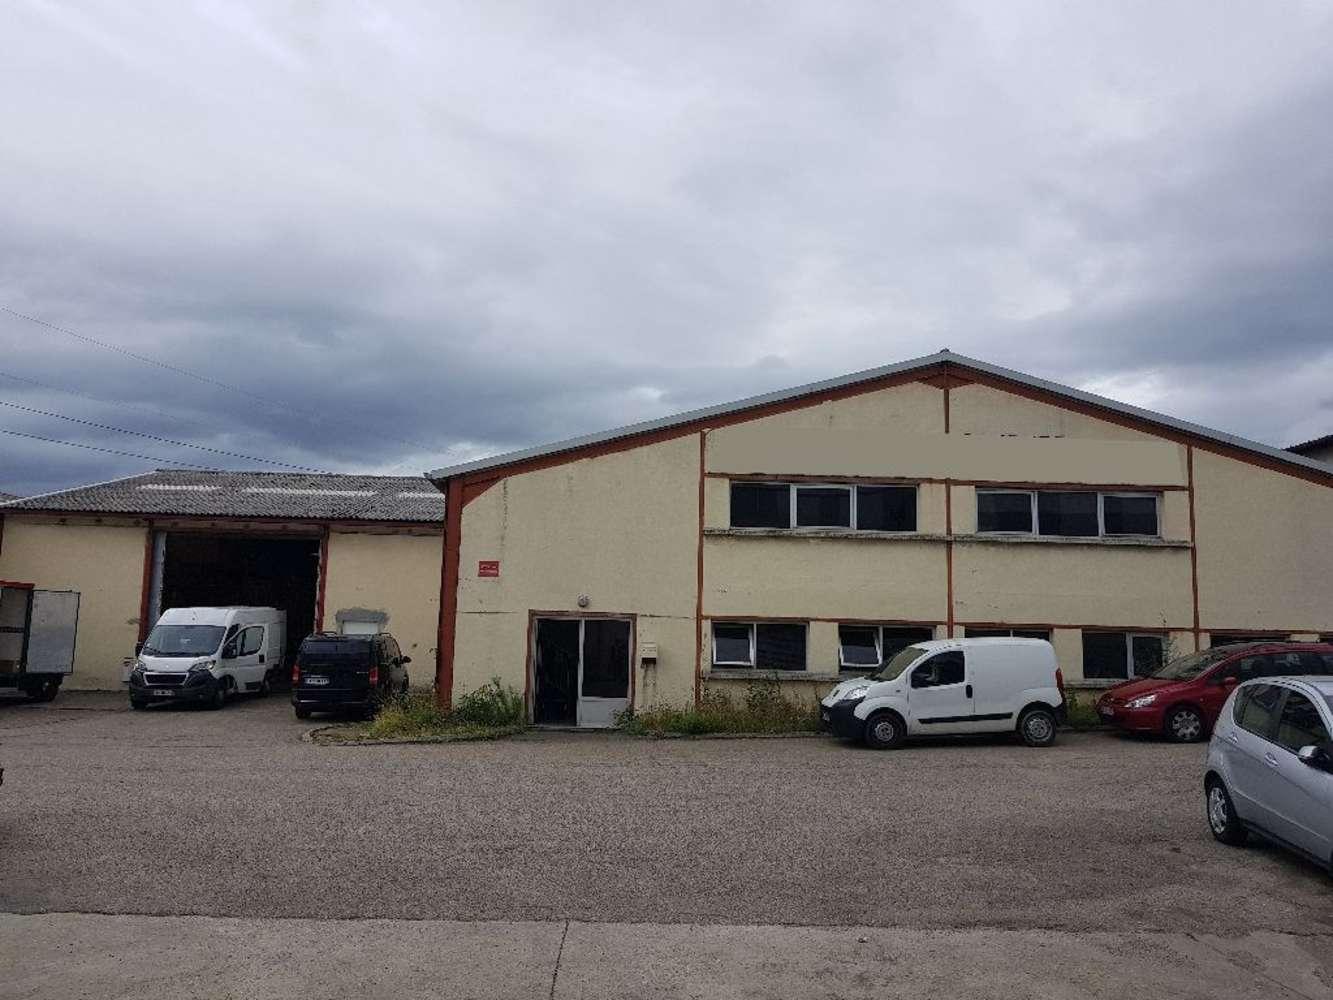 Activités/entrepôt Chassagny, 69700 - Vente entrepot Lyon / Chassagny (69) - 10067076